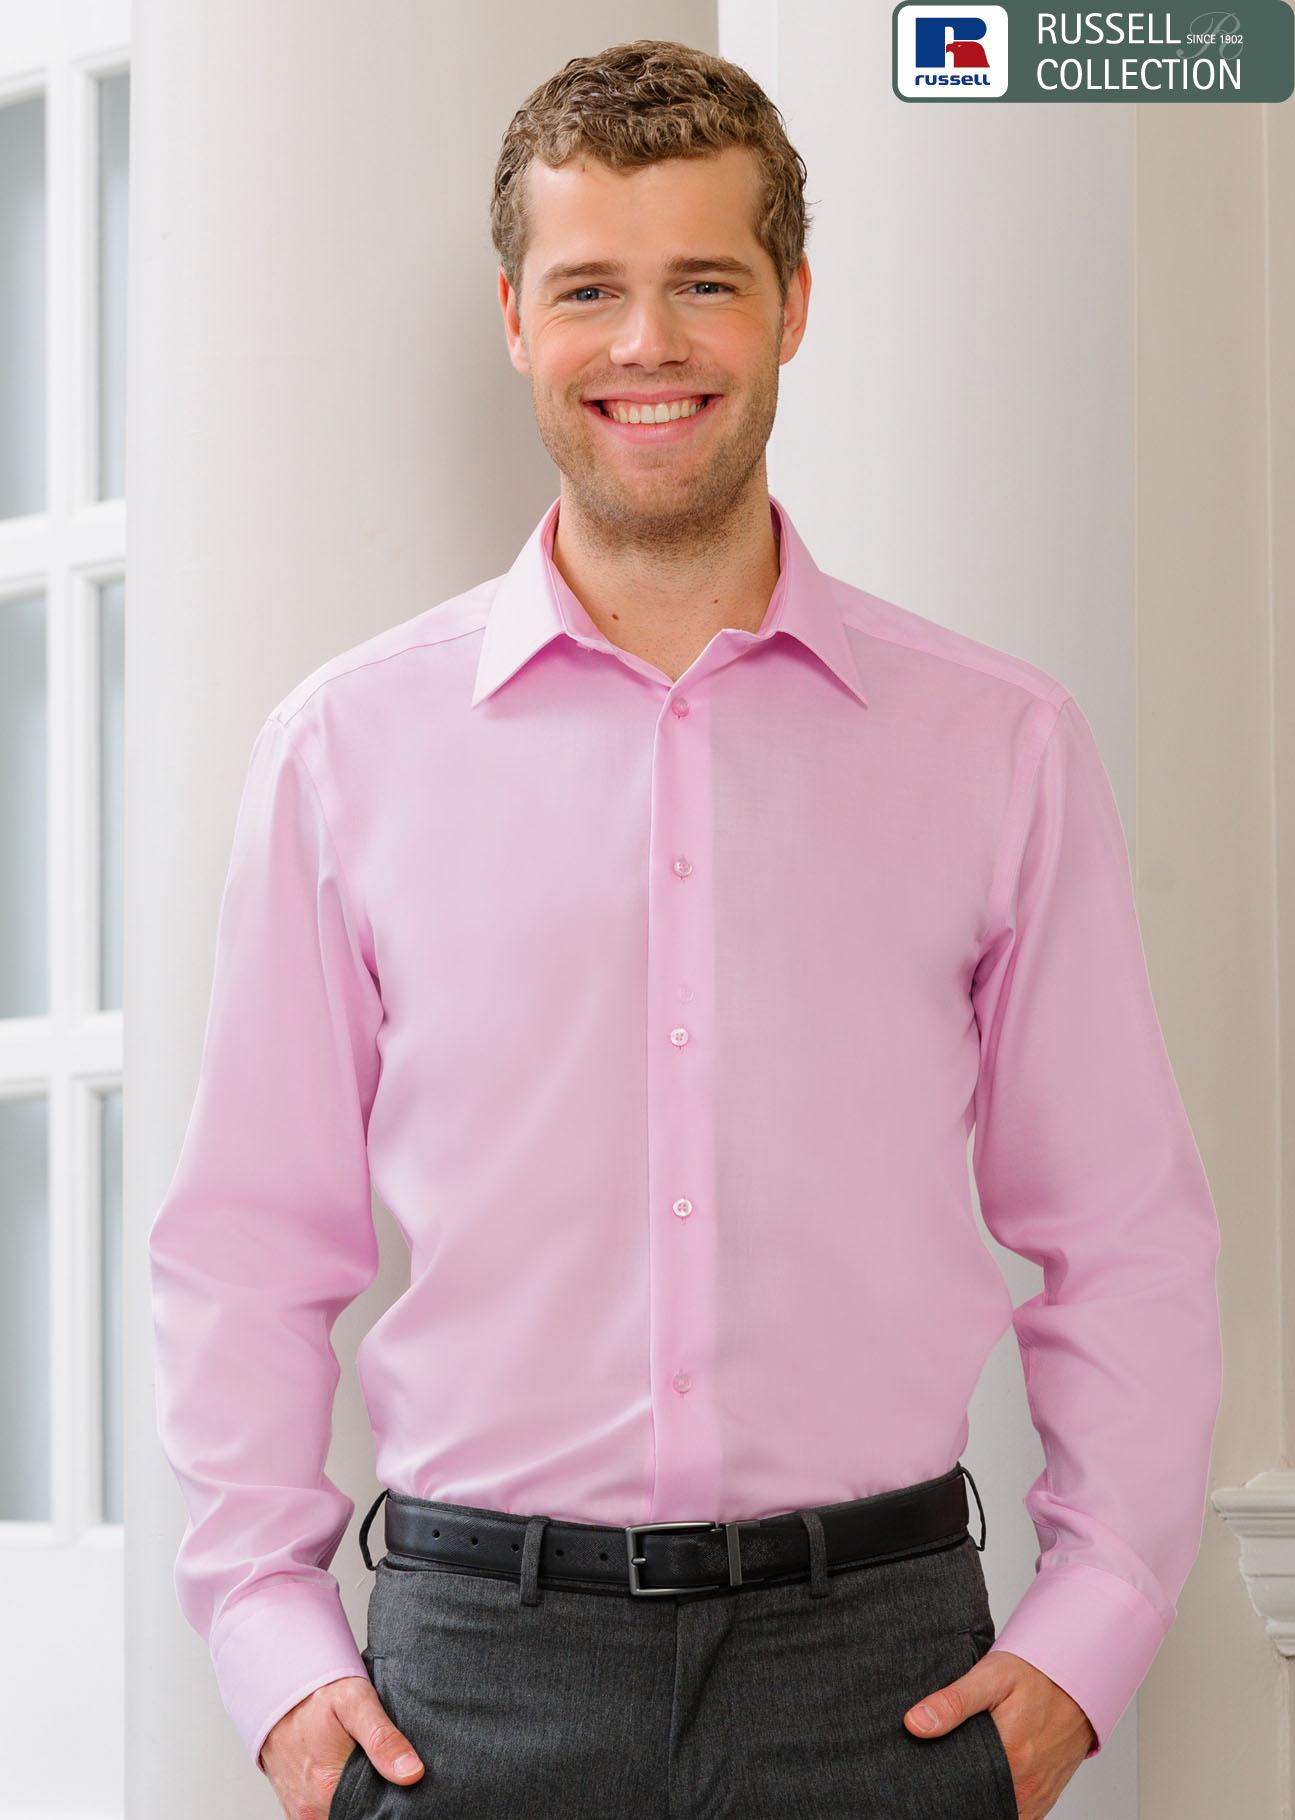 Russell, Bügelfreies tailliertes Langarm-Hemd, Textilien « Merkur ... 47f0872076